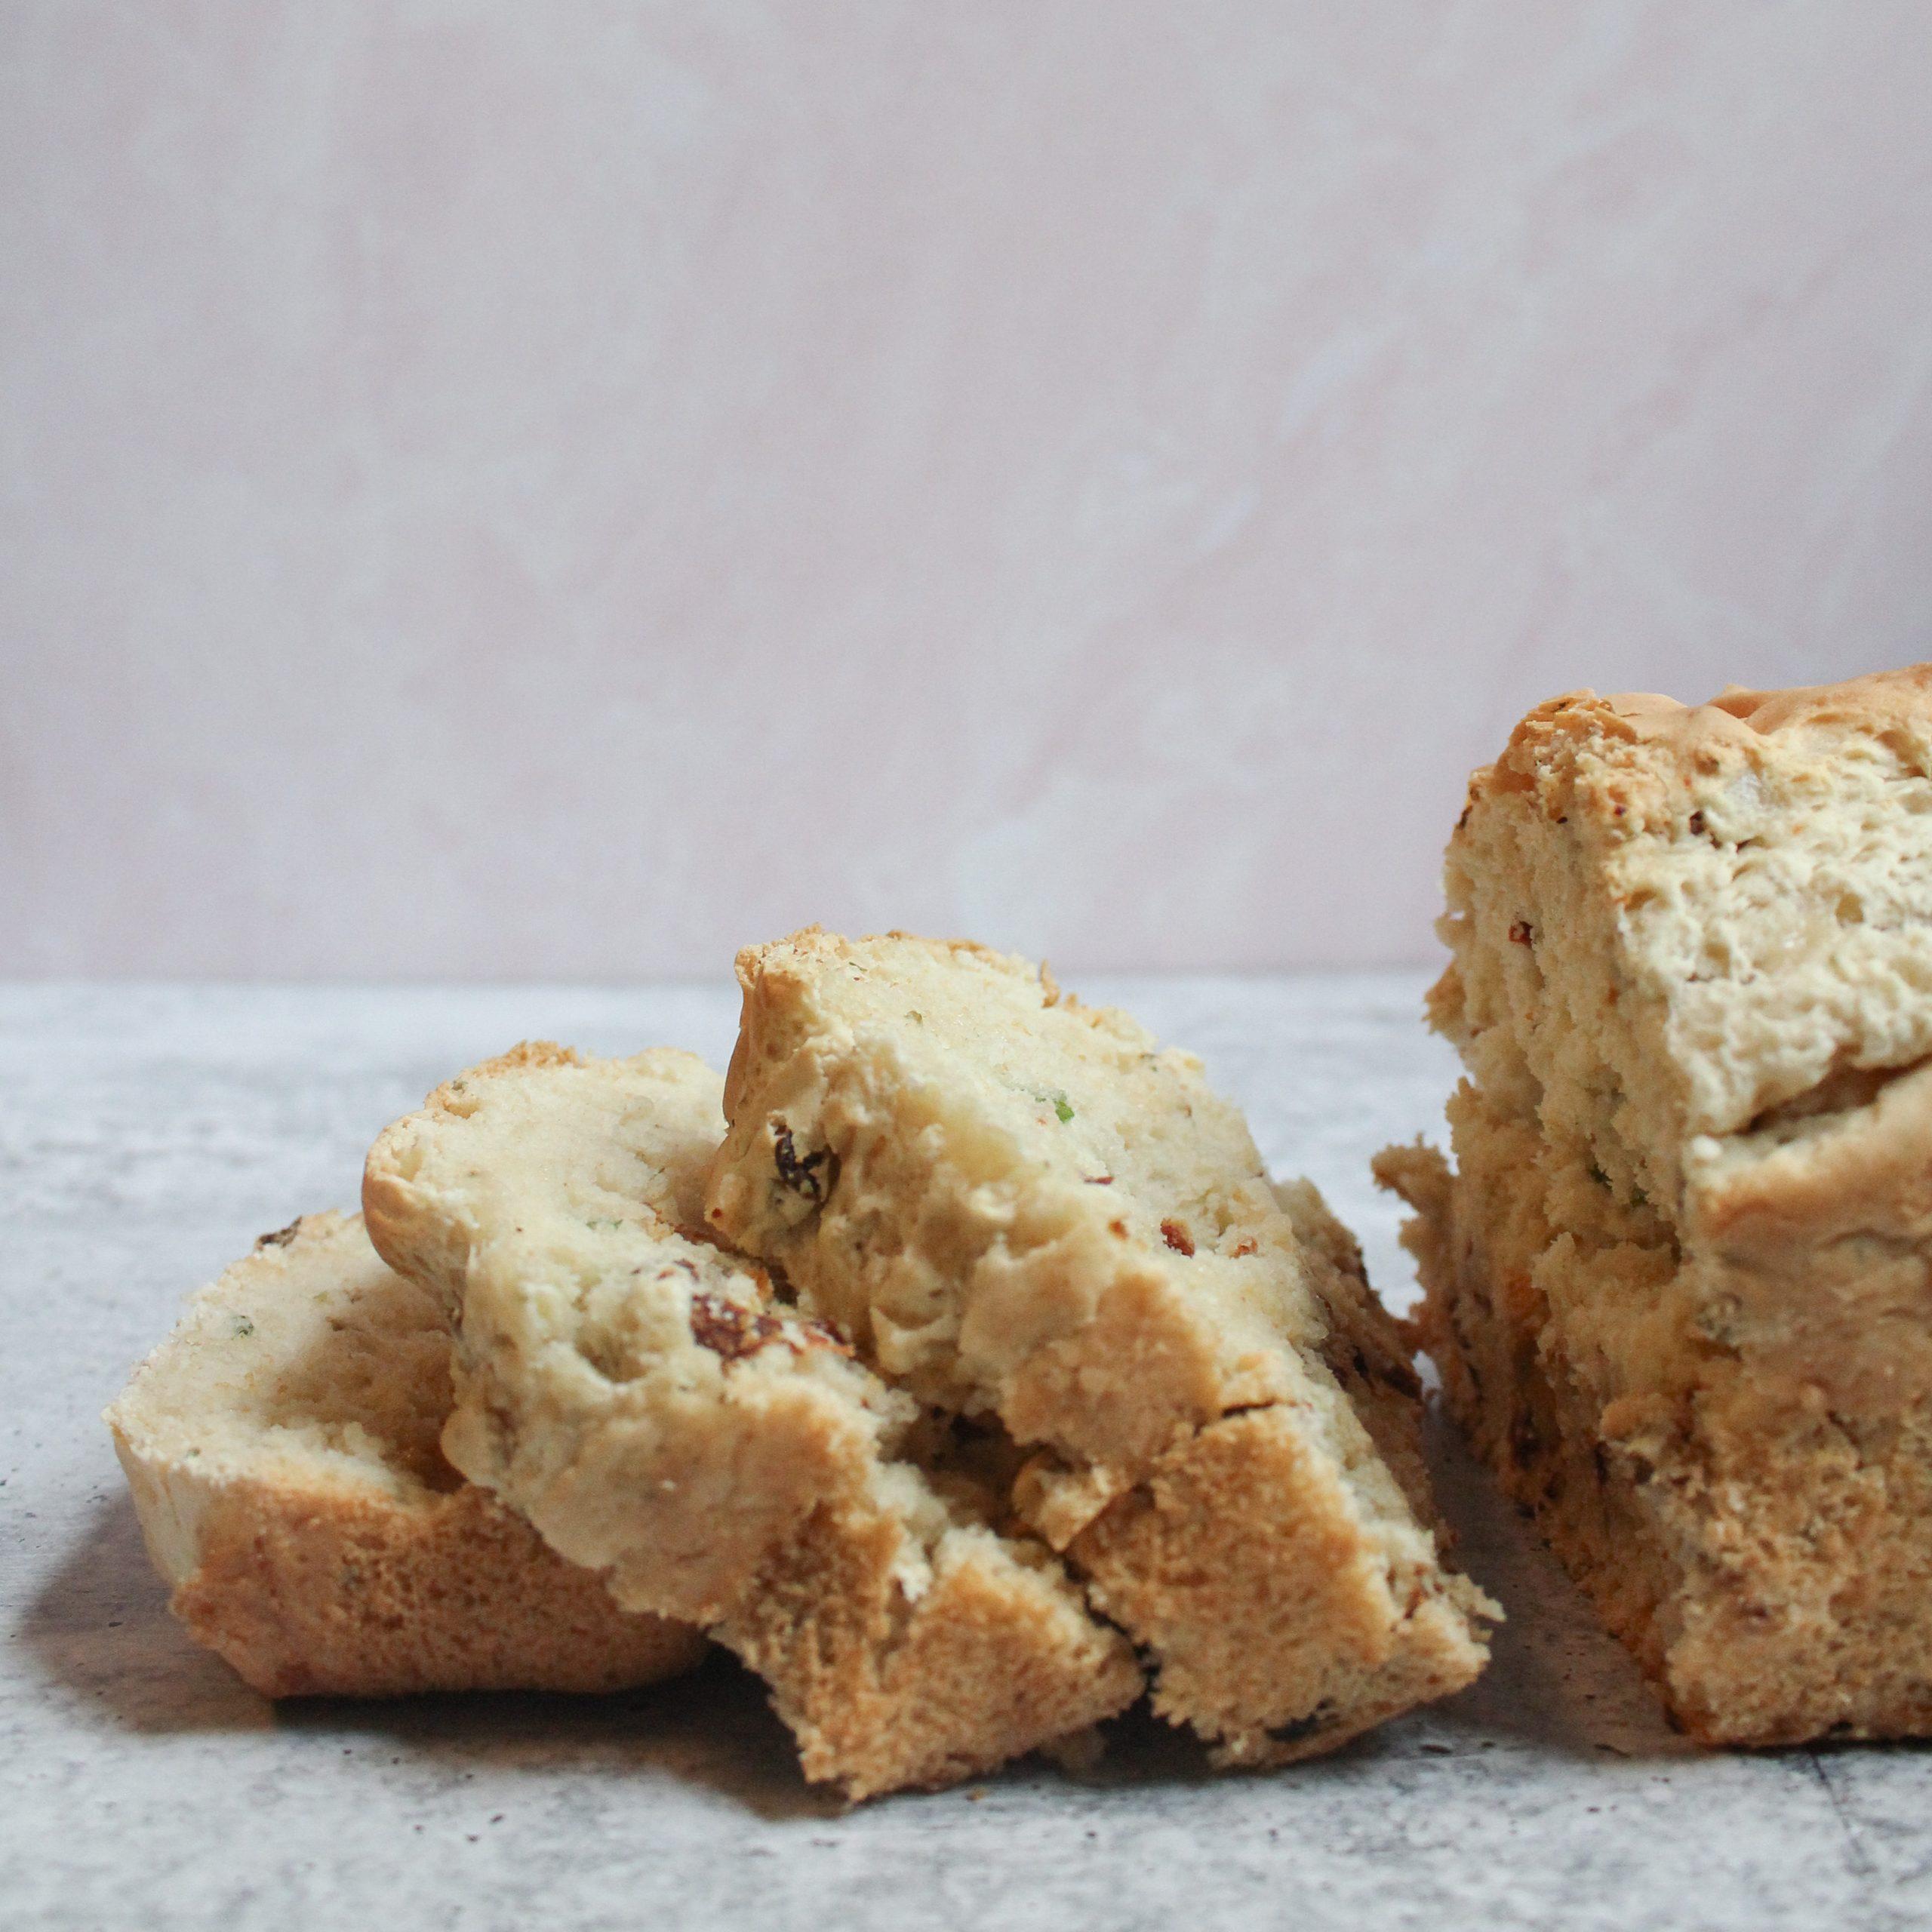 Vegan Pizza Beer Bread Flour Homemade Basil Marinara Featured Image